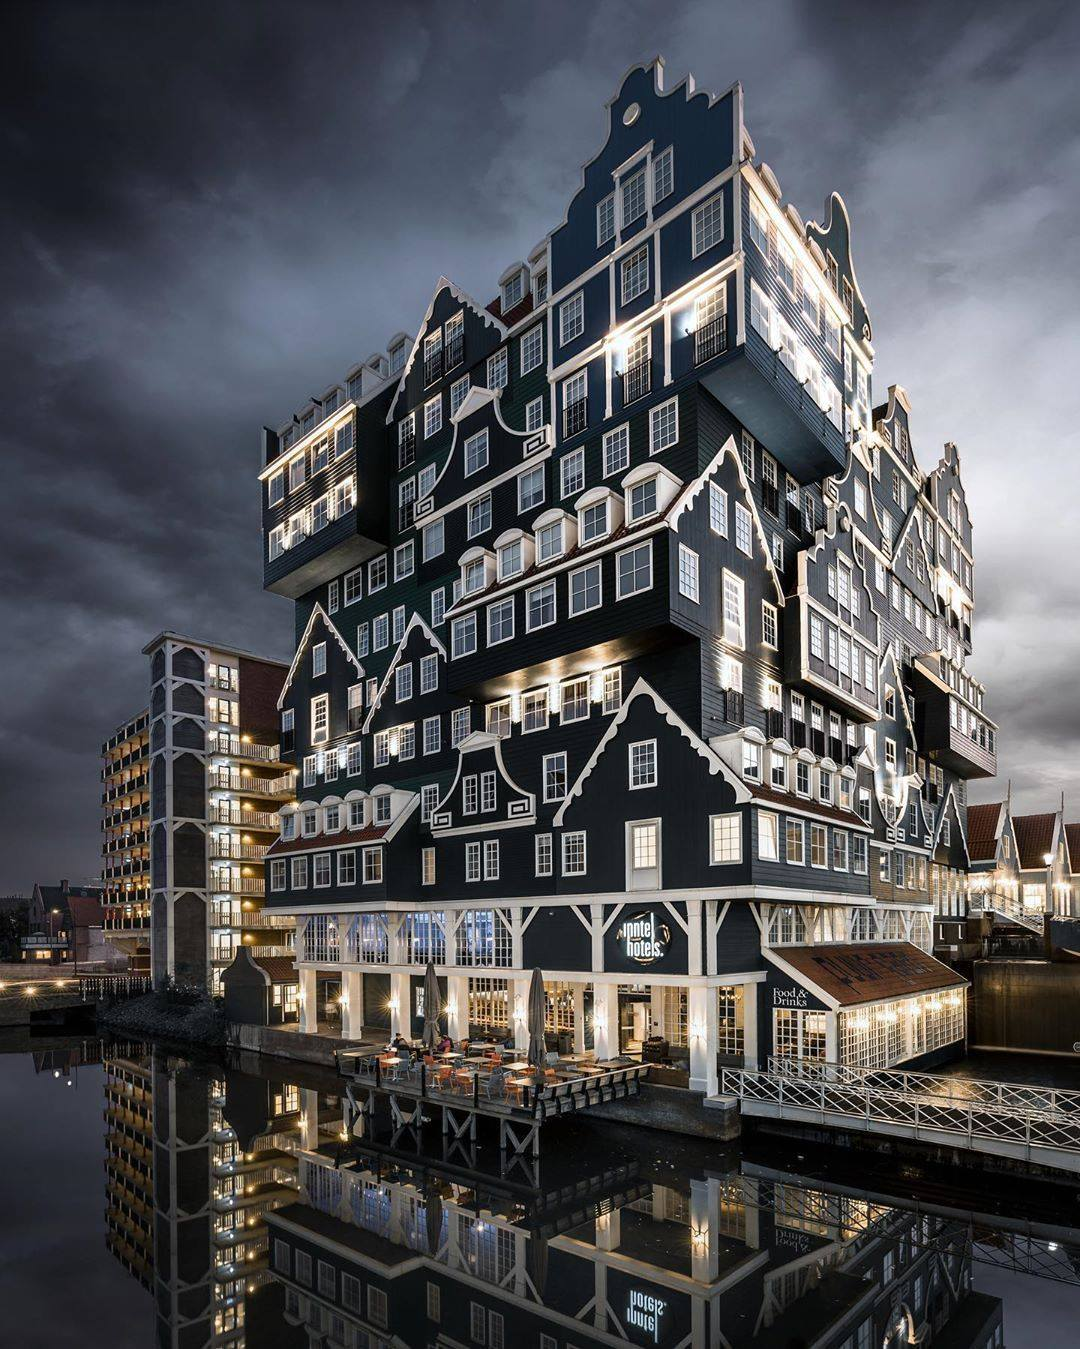 Zaandam, Netherlands - Art Photo taken by eroenvandam - BlogFanArt